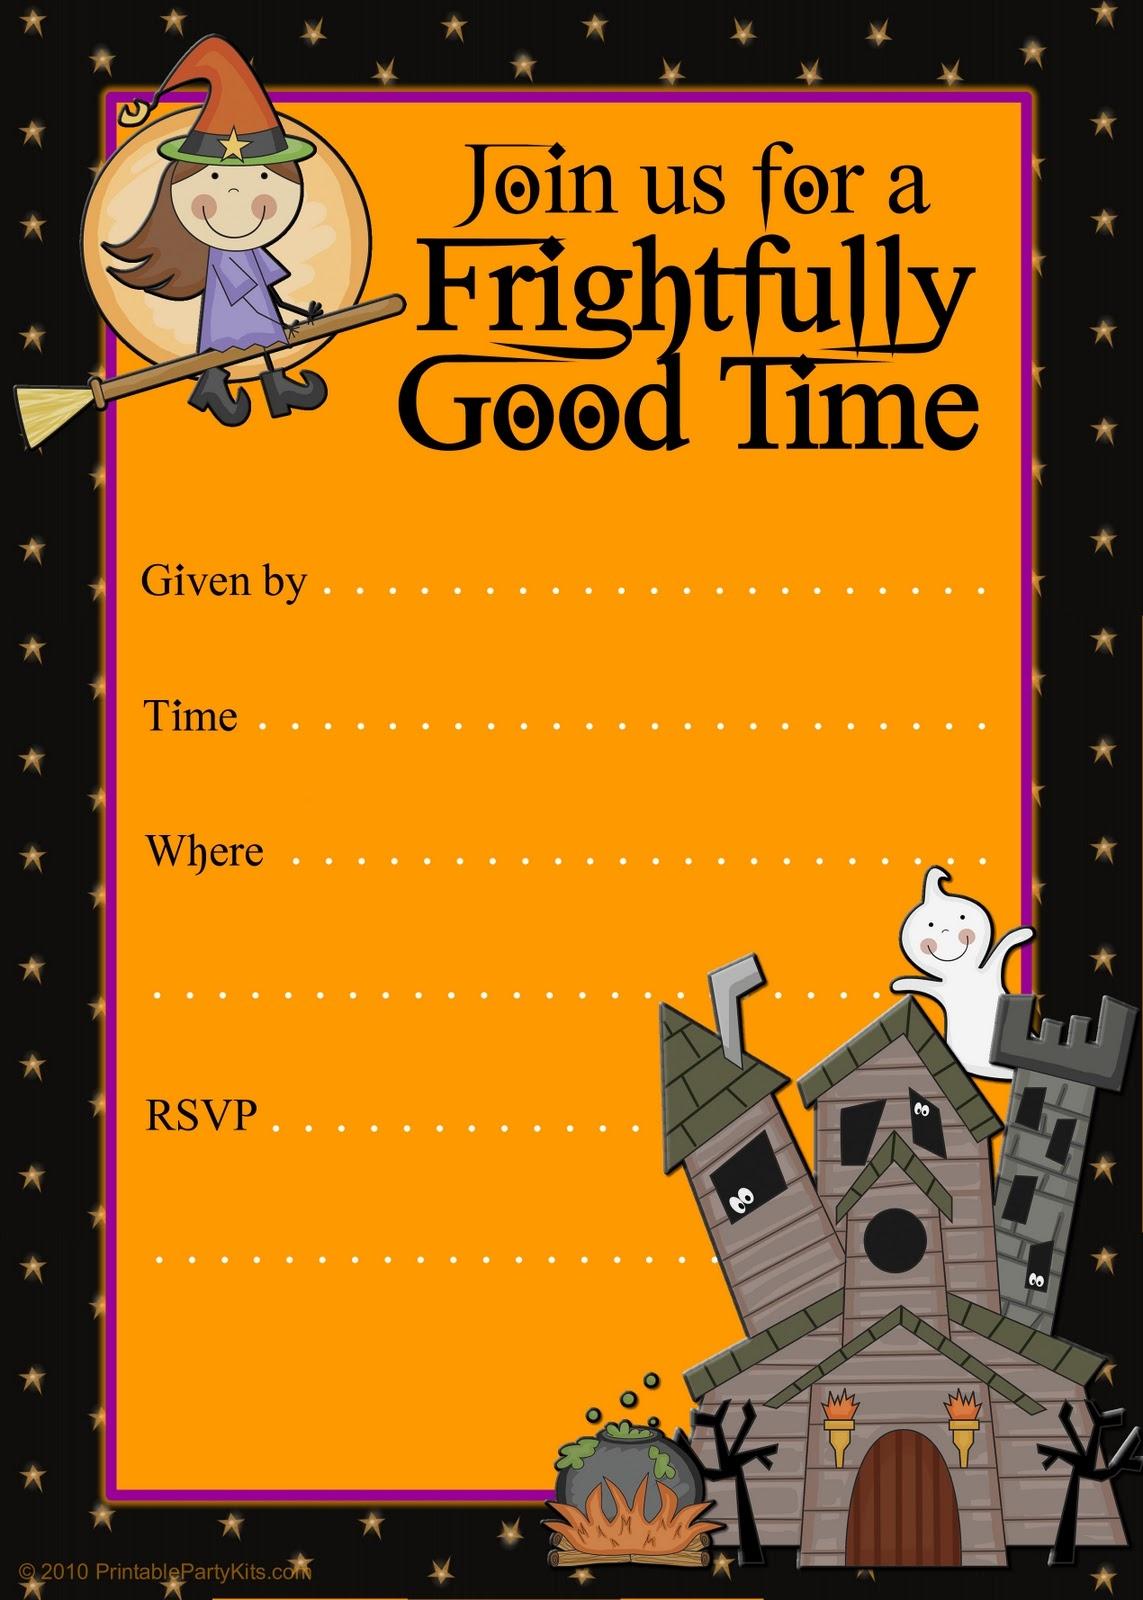 Of Free Printable Halloween Birthday Party Invitations On Printable - Free Printable Halloween Birthday Party Invitations